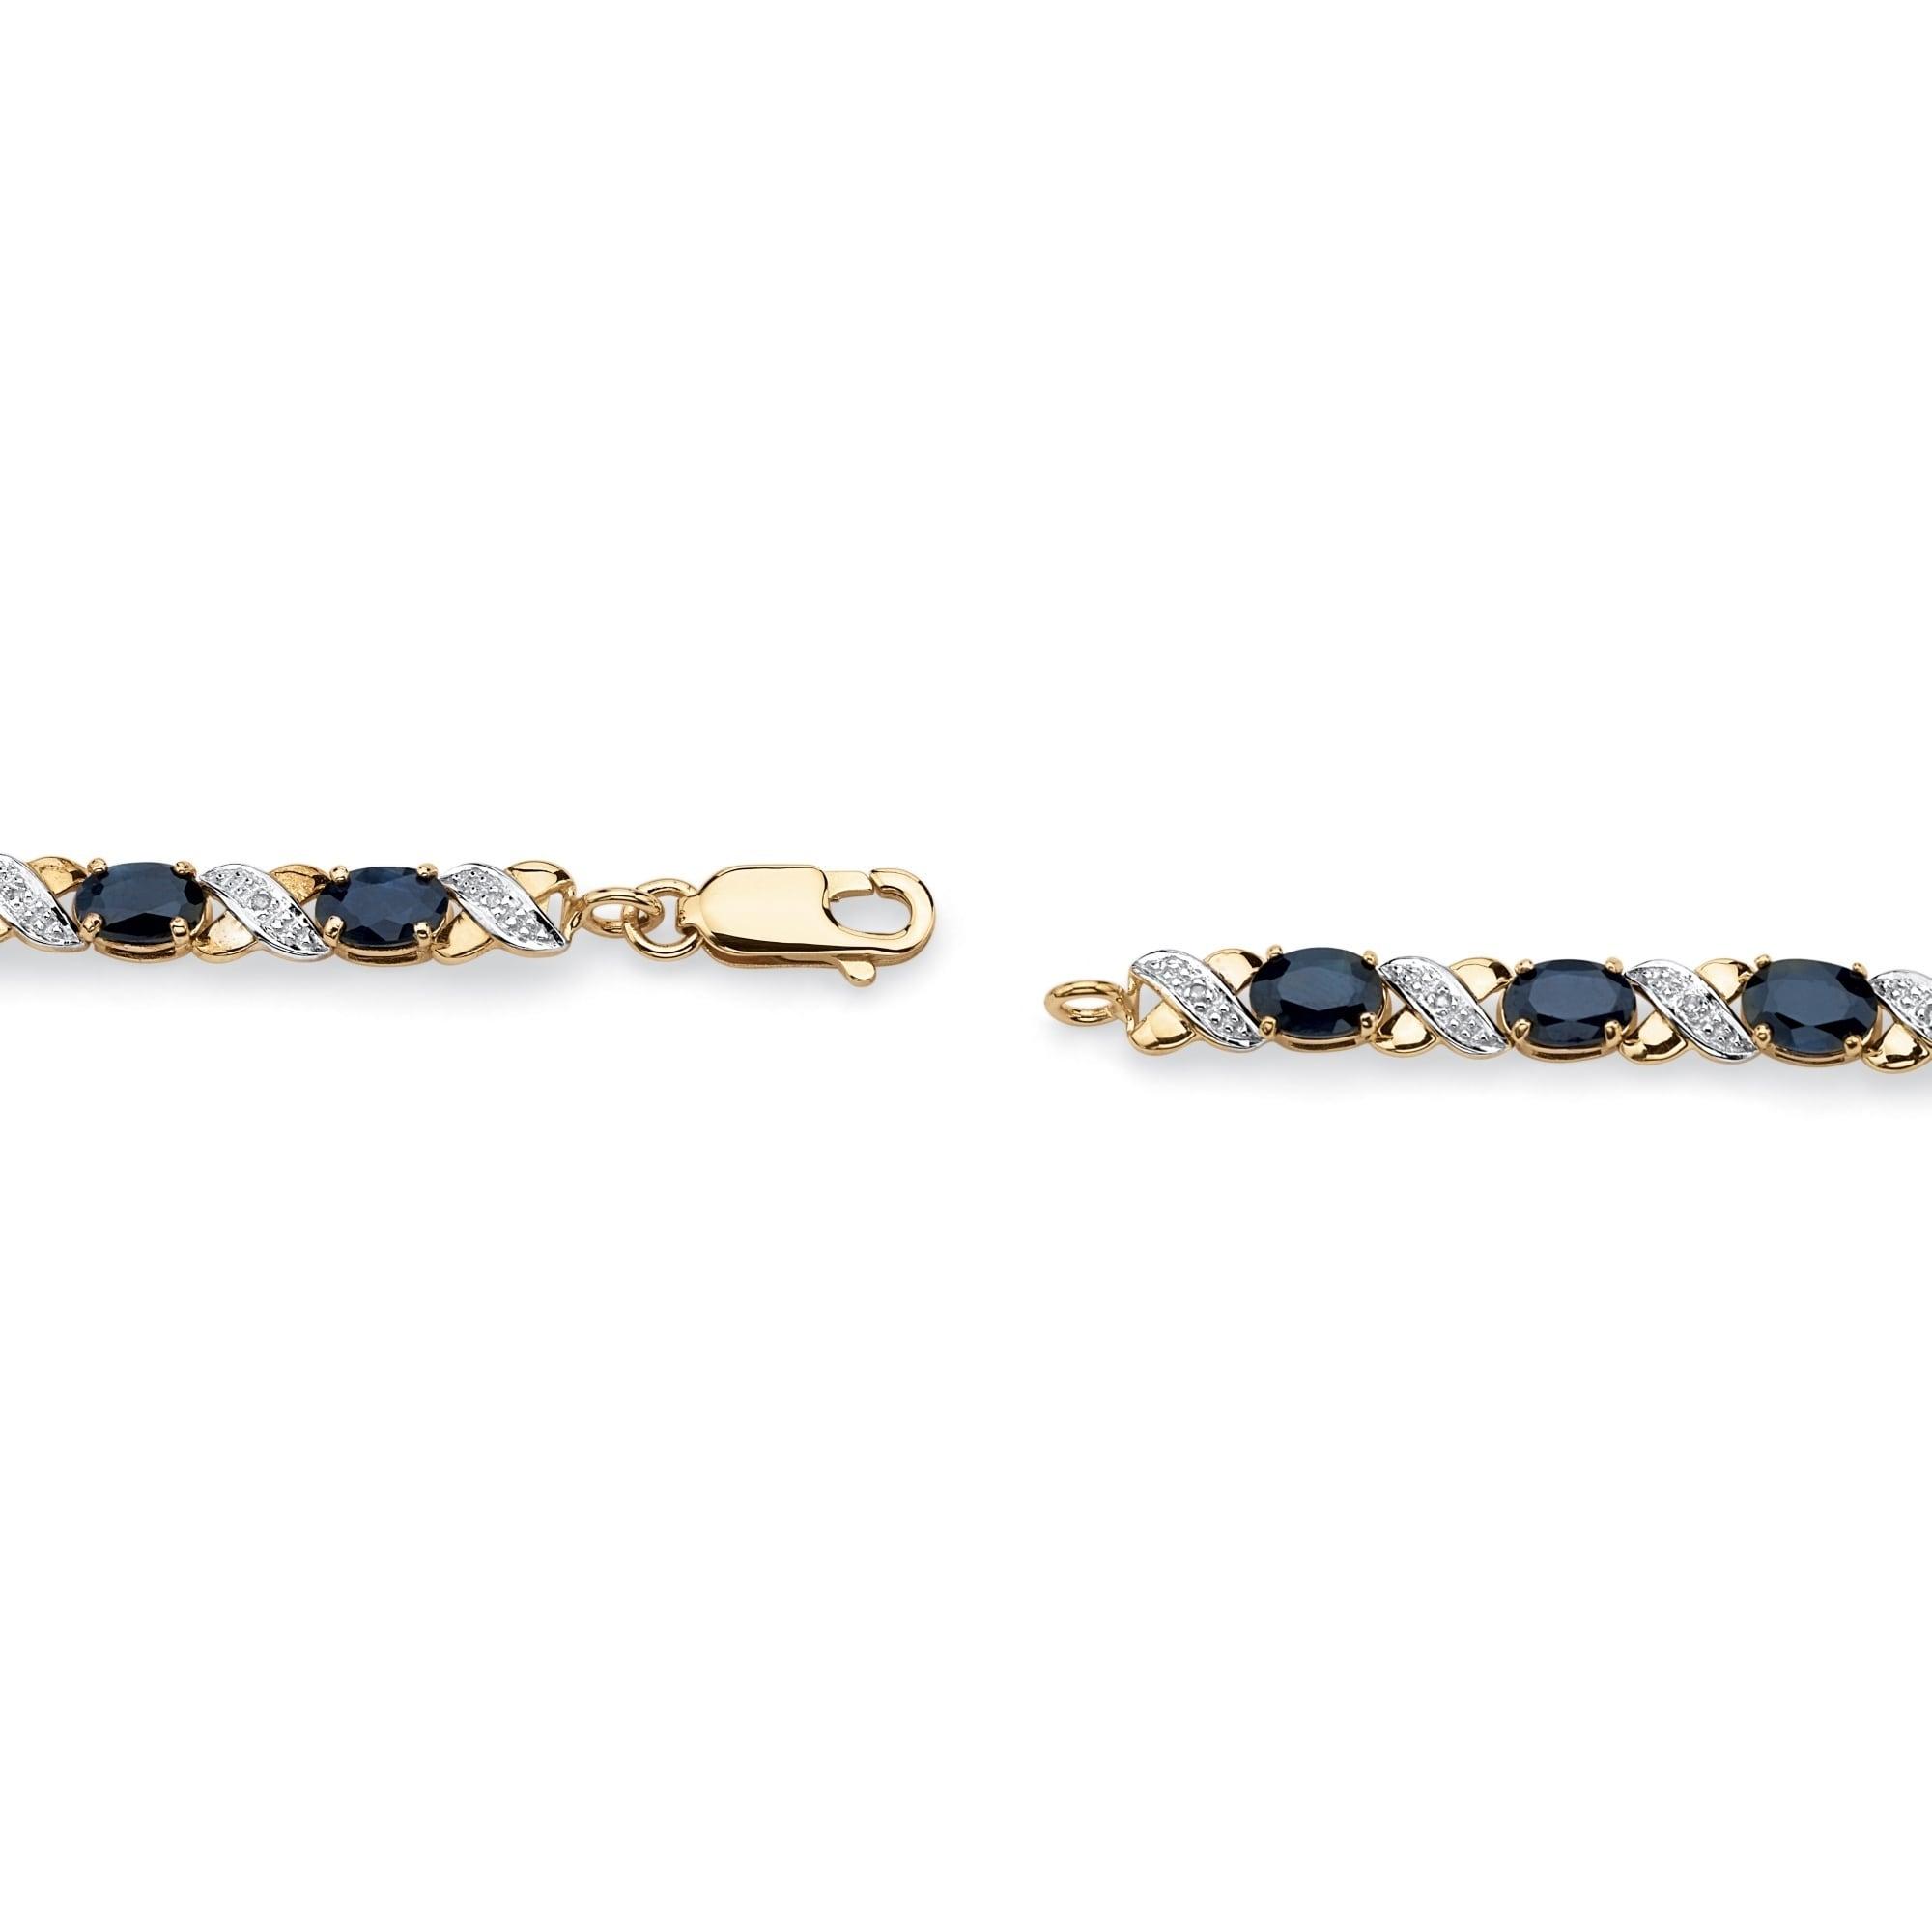 Vintage 10k Yellow Gold Bracelet Blue Topaz Tennis Bracelet 8.6 carats 7 Tennis Bracelet Oval Cut